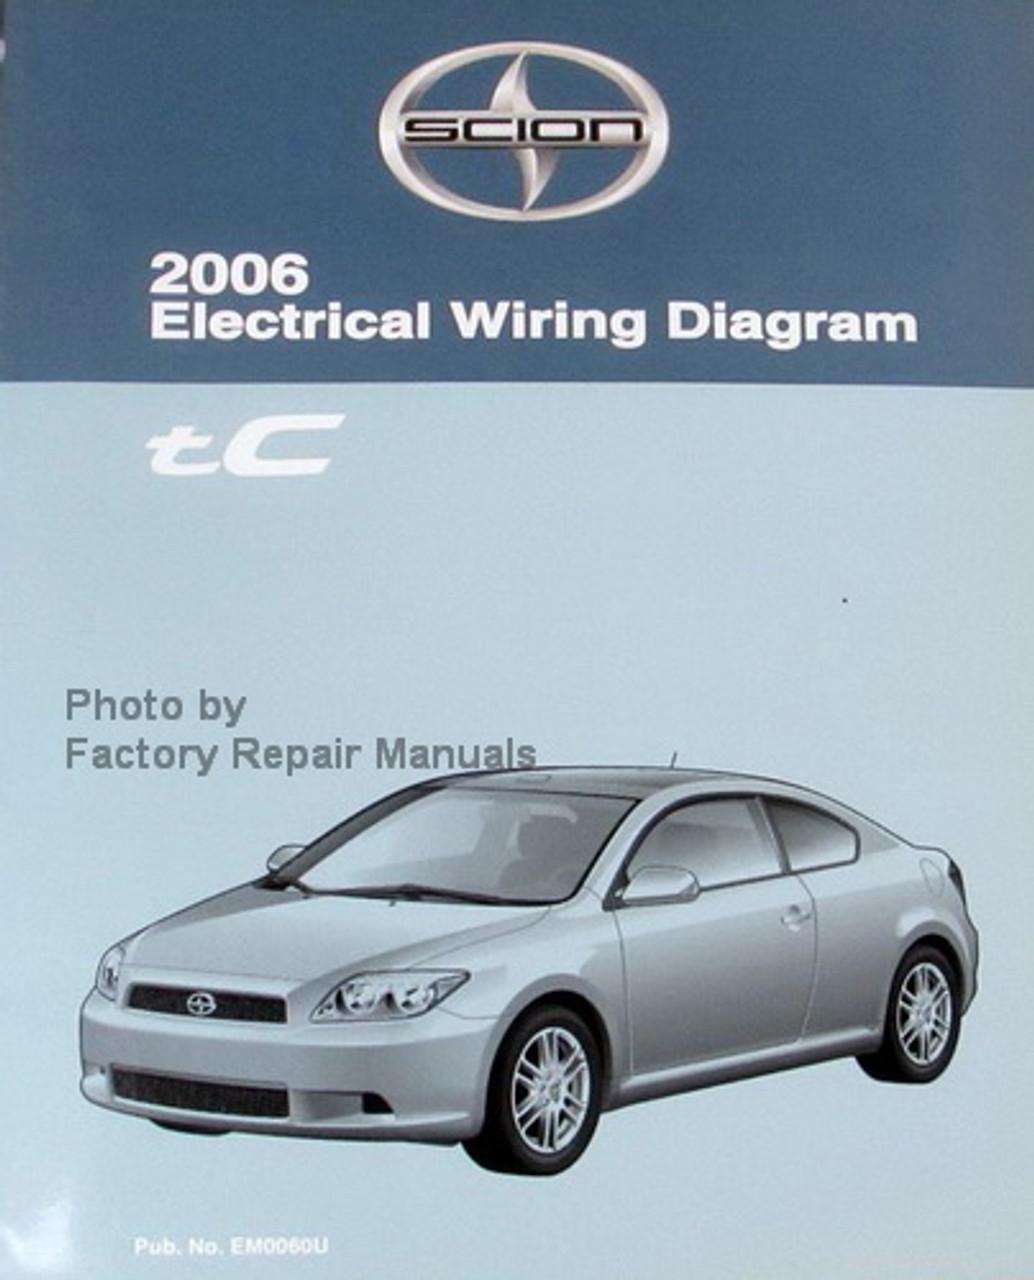 2010 SCION tC Shop Service Repair Manual Complete Set